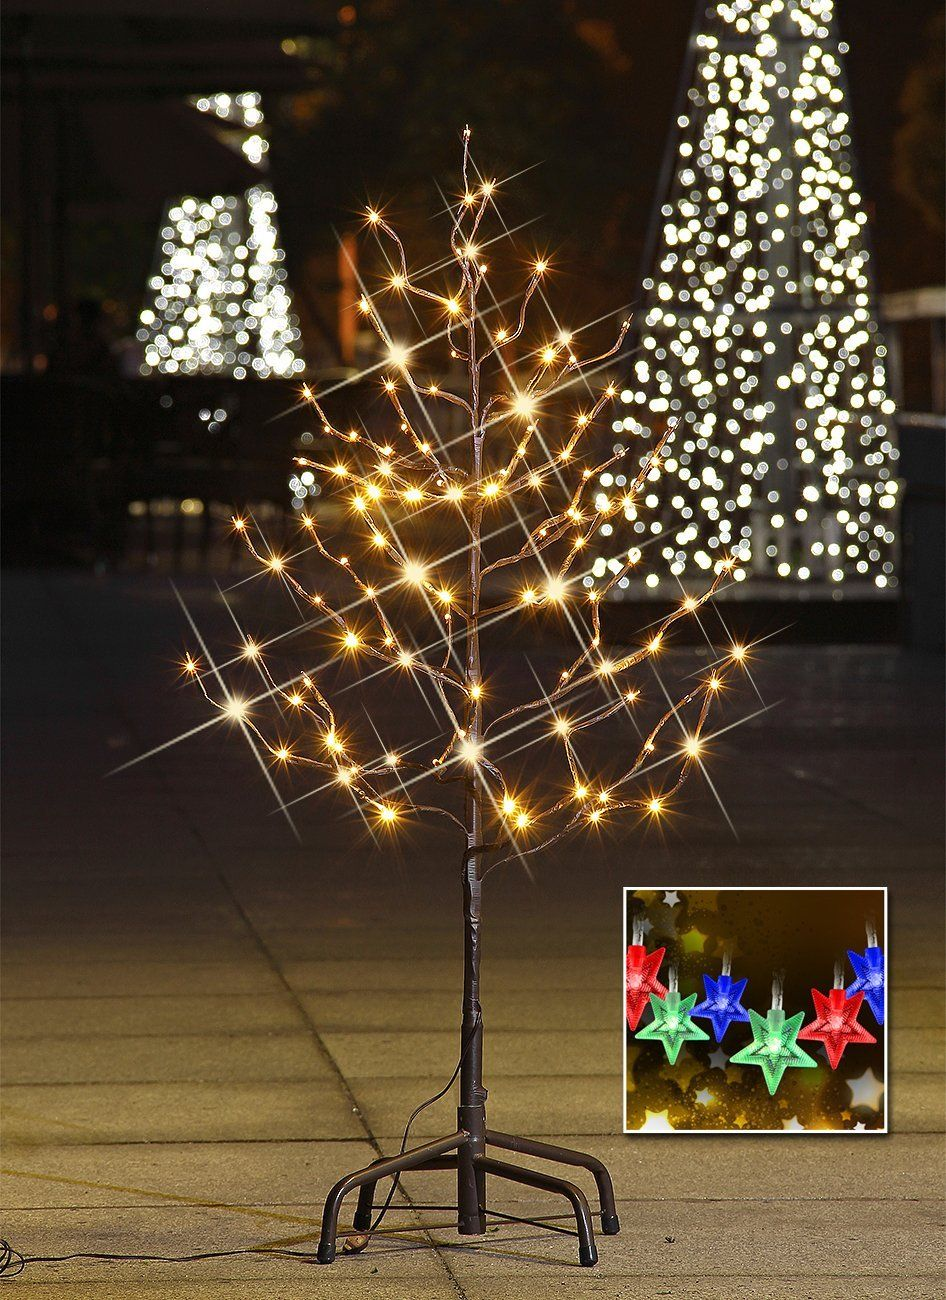 Lightshare 3ft 112l Led Star Light Tree Free Gift 10l Led Star Twinkling Light Christmas Decorations Led Star Lights Tree Lighting